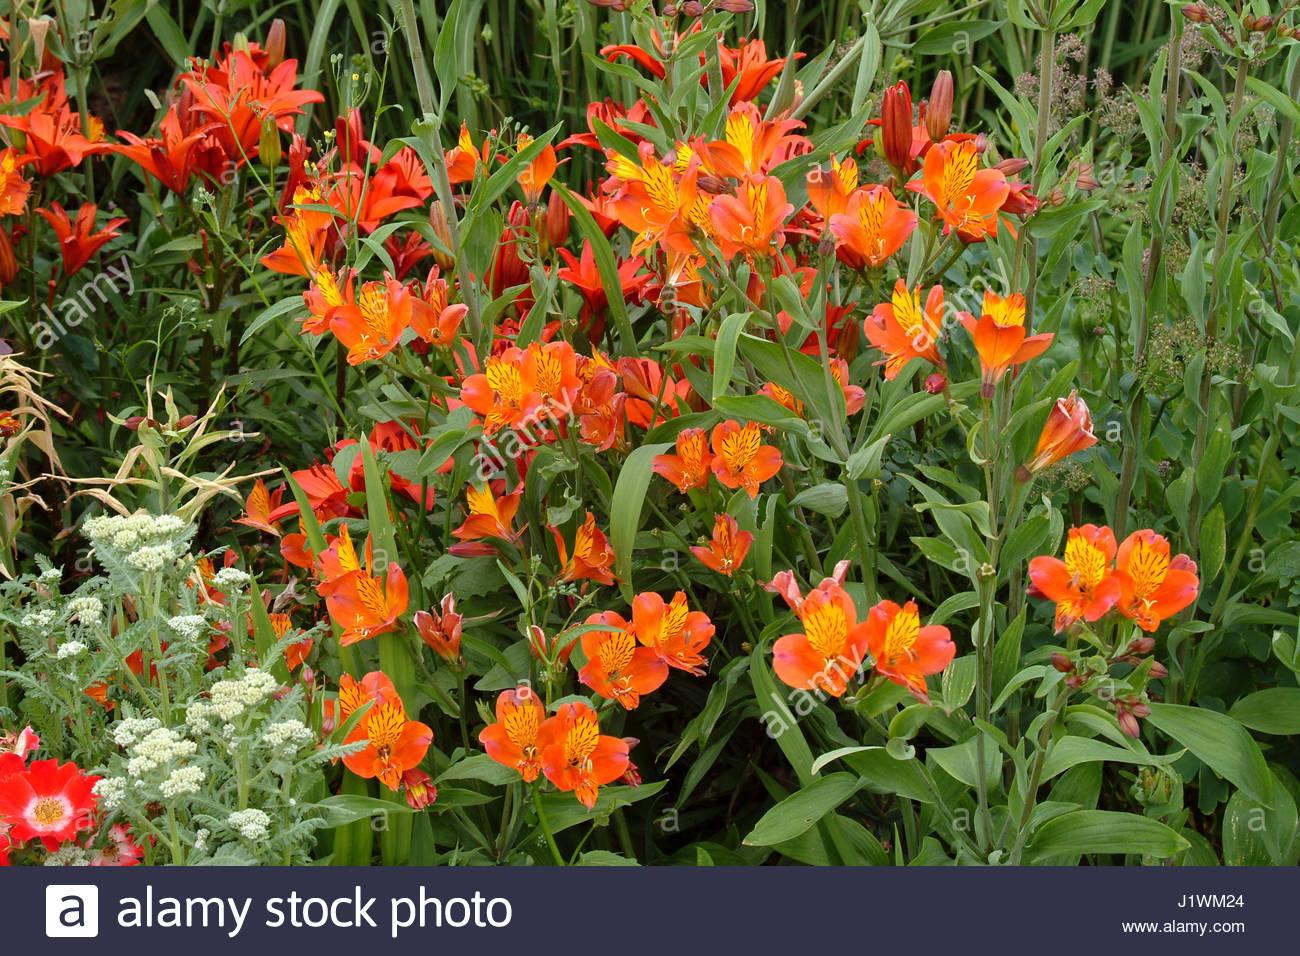 Alstroemeria orange glory peruvian lily stock photo 138862140 alamy alstroemeria orange glory peruvian lily izmirmasajfo